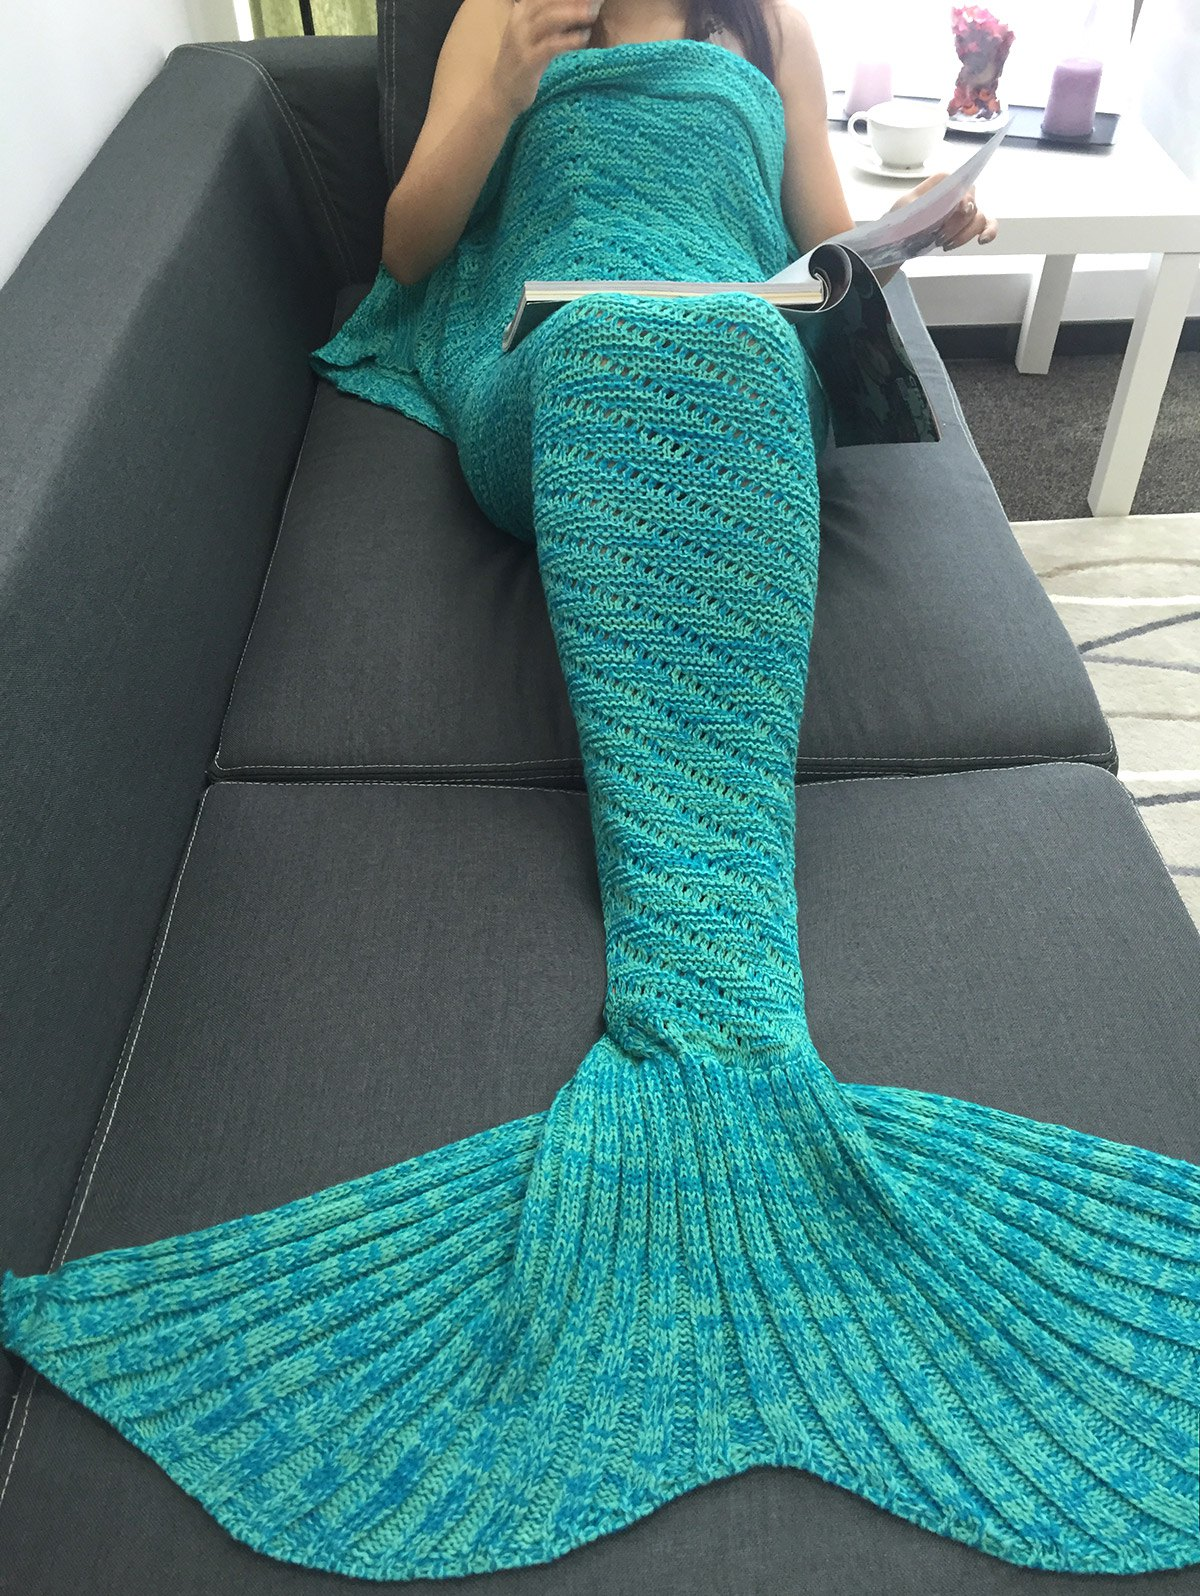 2018 Bedroom Decor Hollow Out Crochet Knit Mermaid Blanket